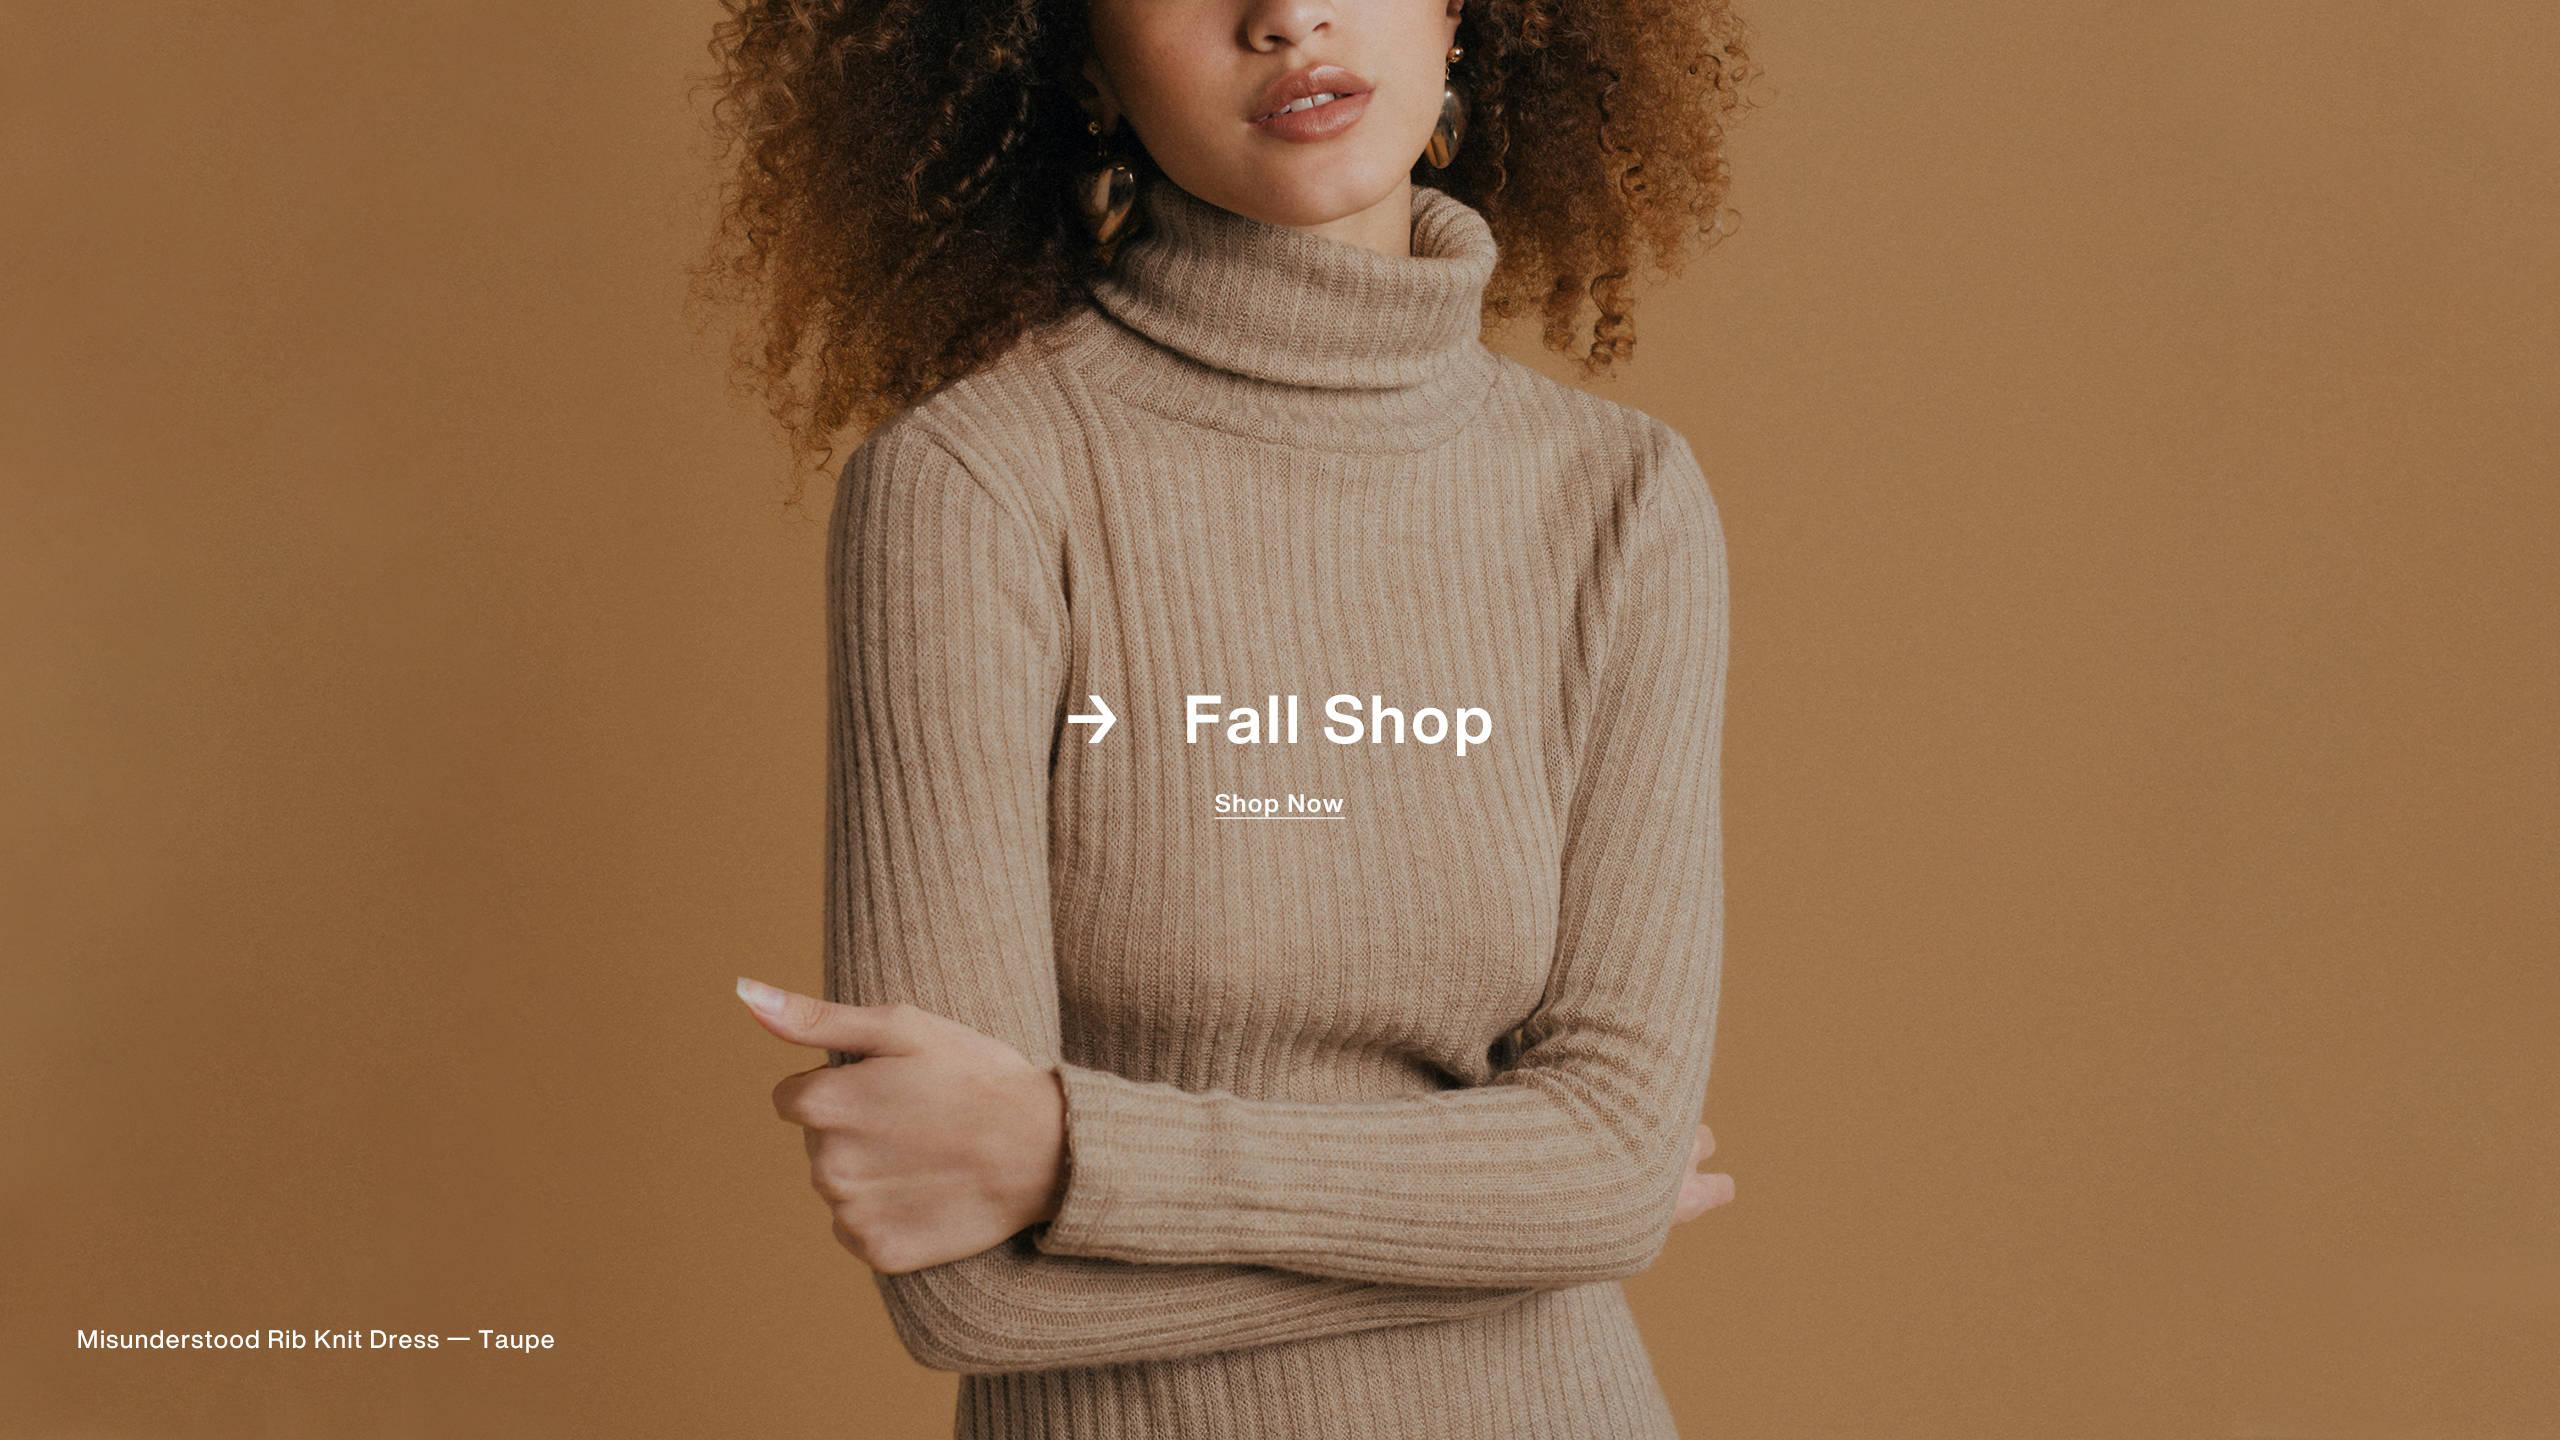 Fall Shop